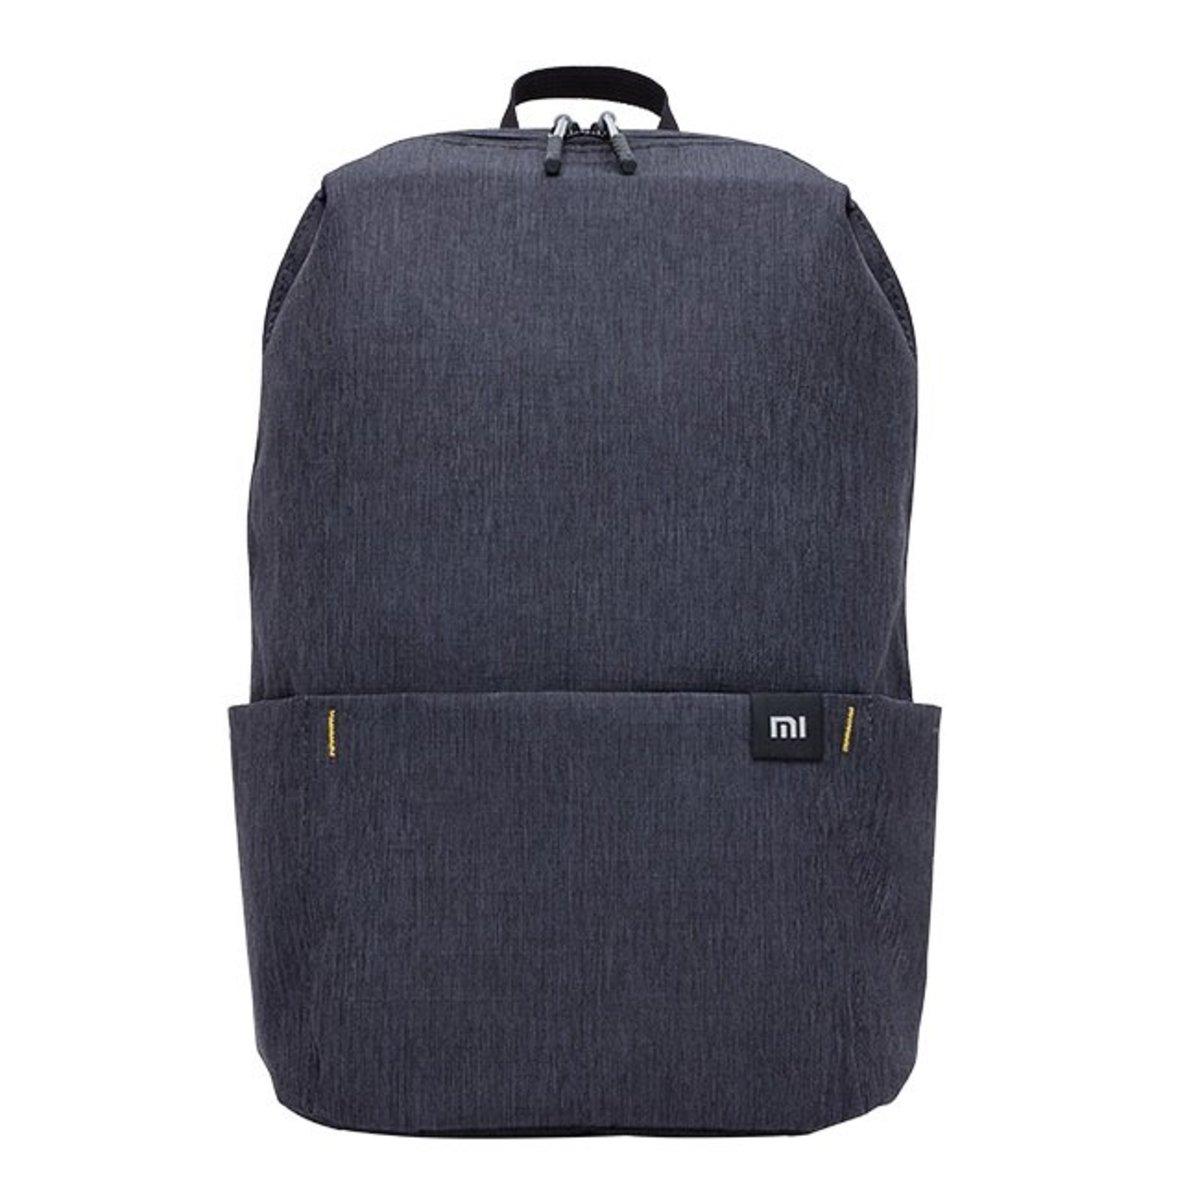 Water Resistant 10L Backpack Black